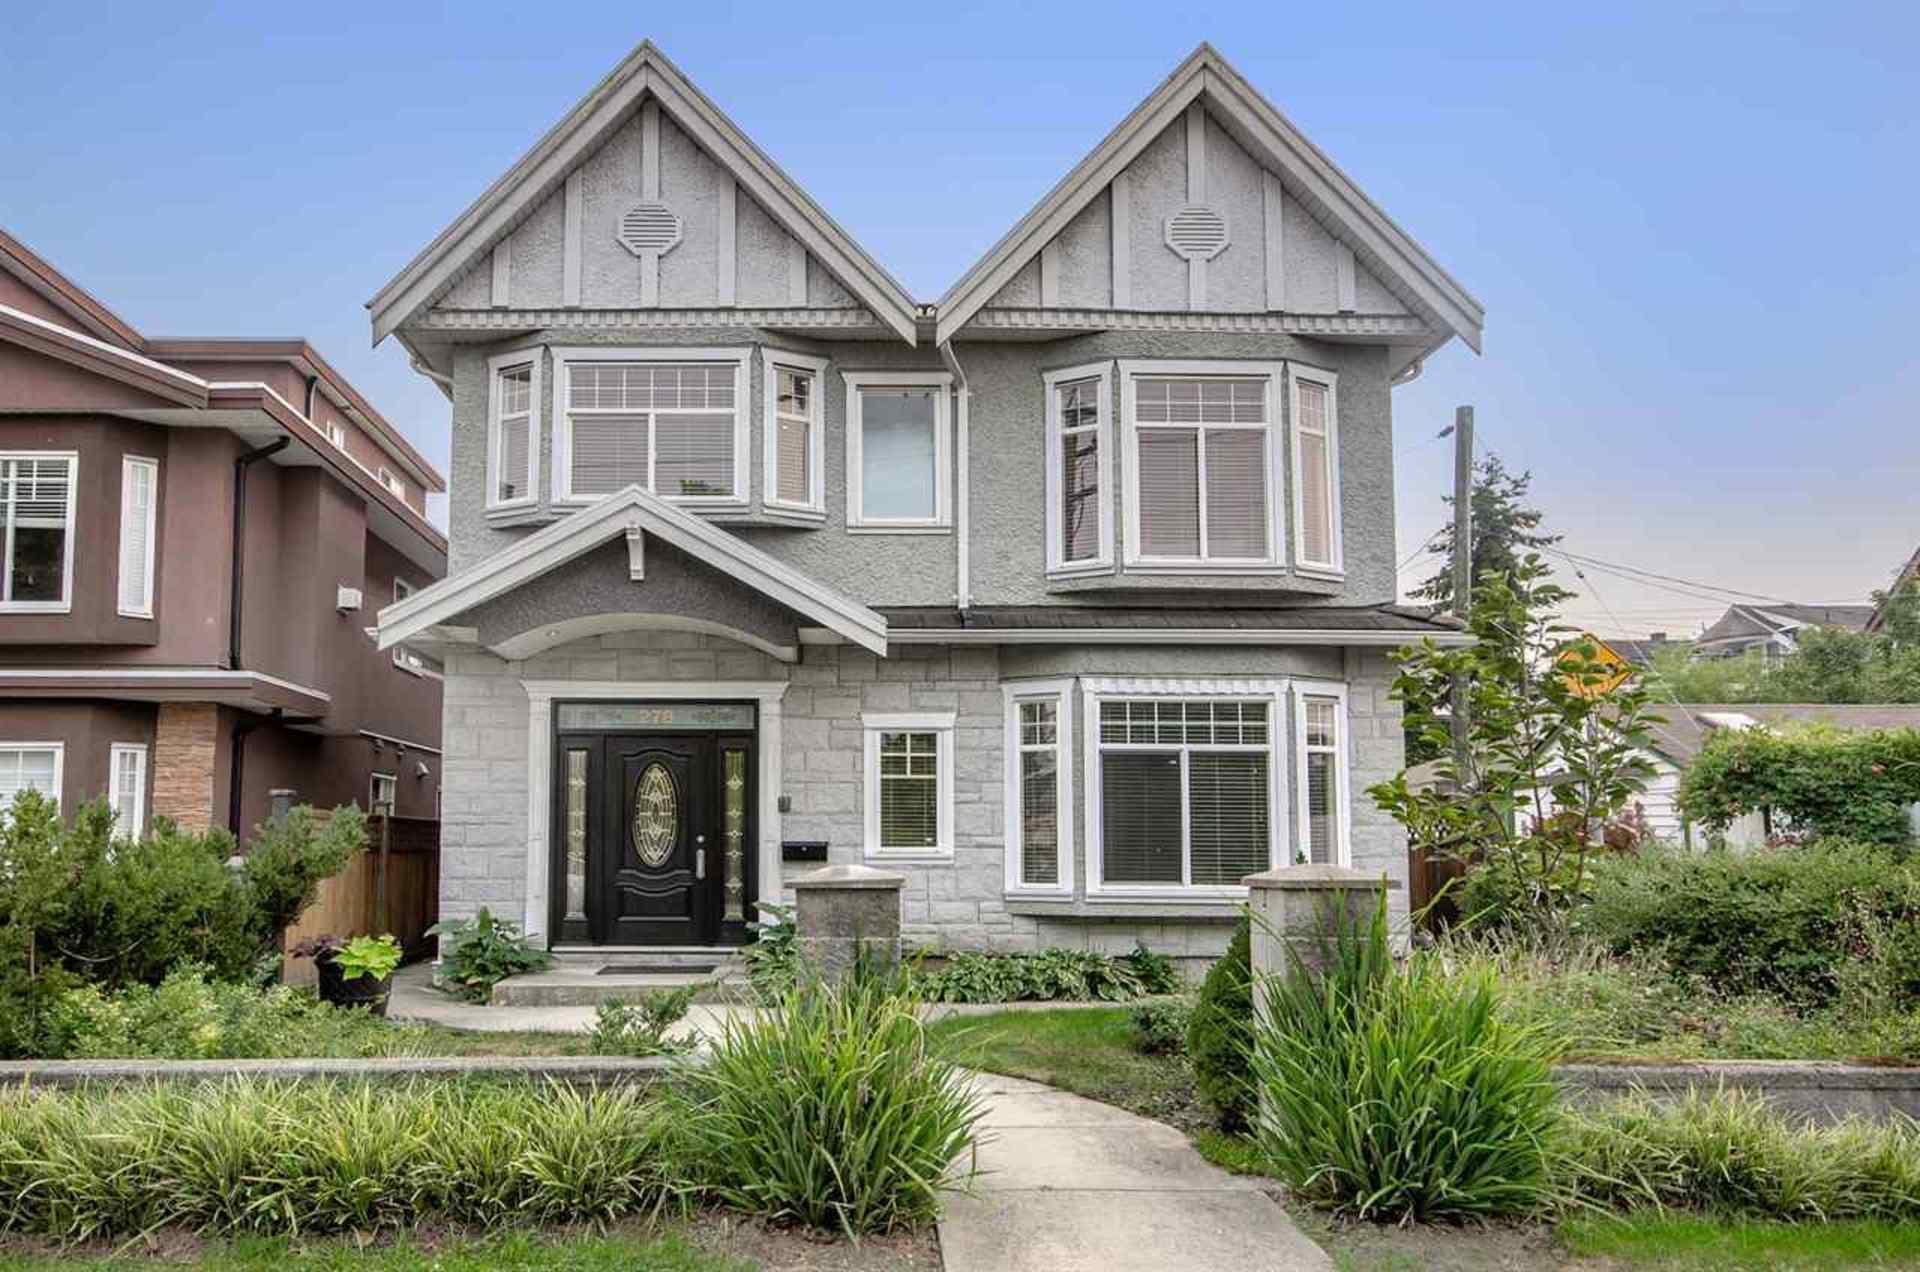 278-e-33rd-avenue-main-vancouver-east-01 at 278 E 33rd Avenue, Main, Vancouver East